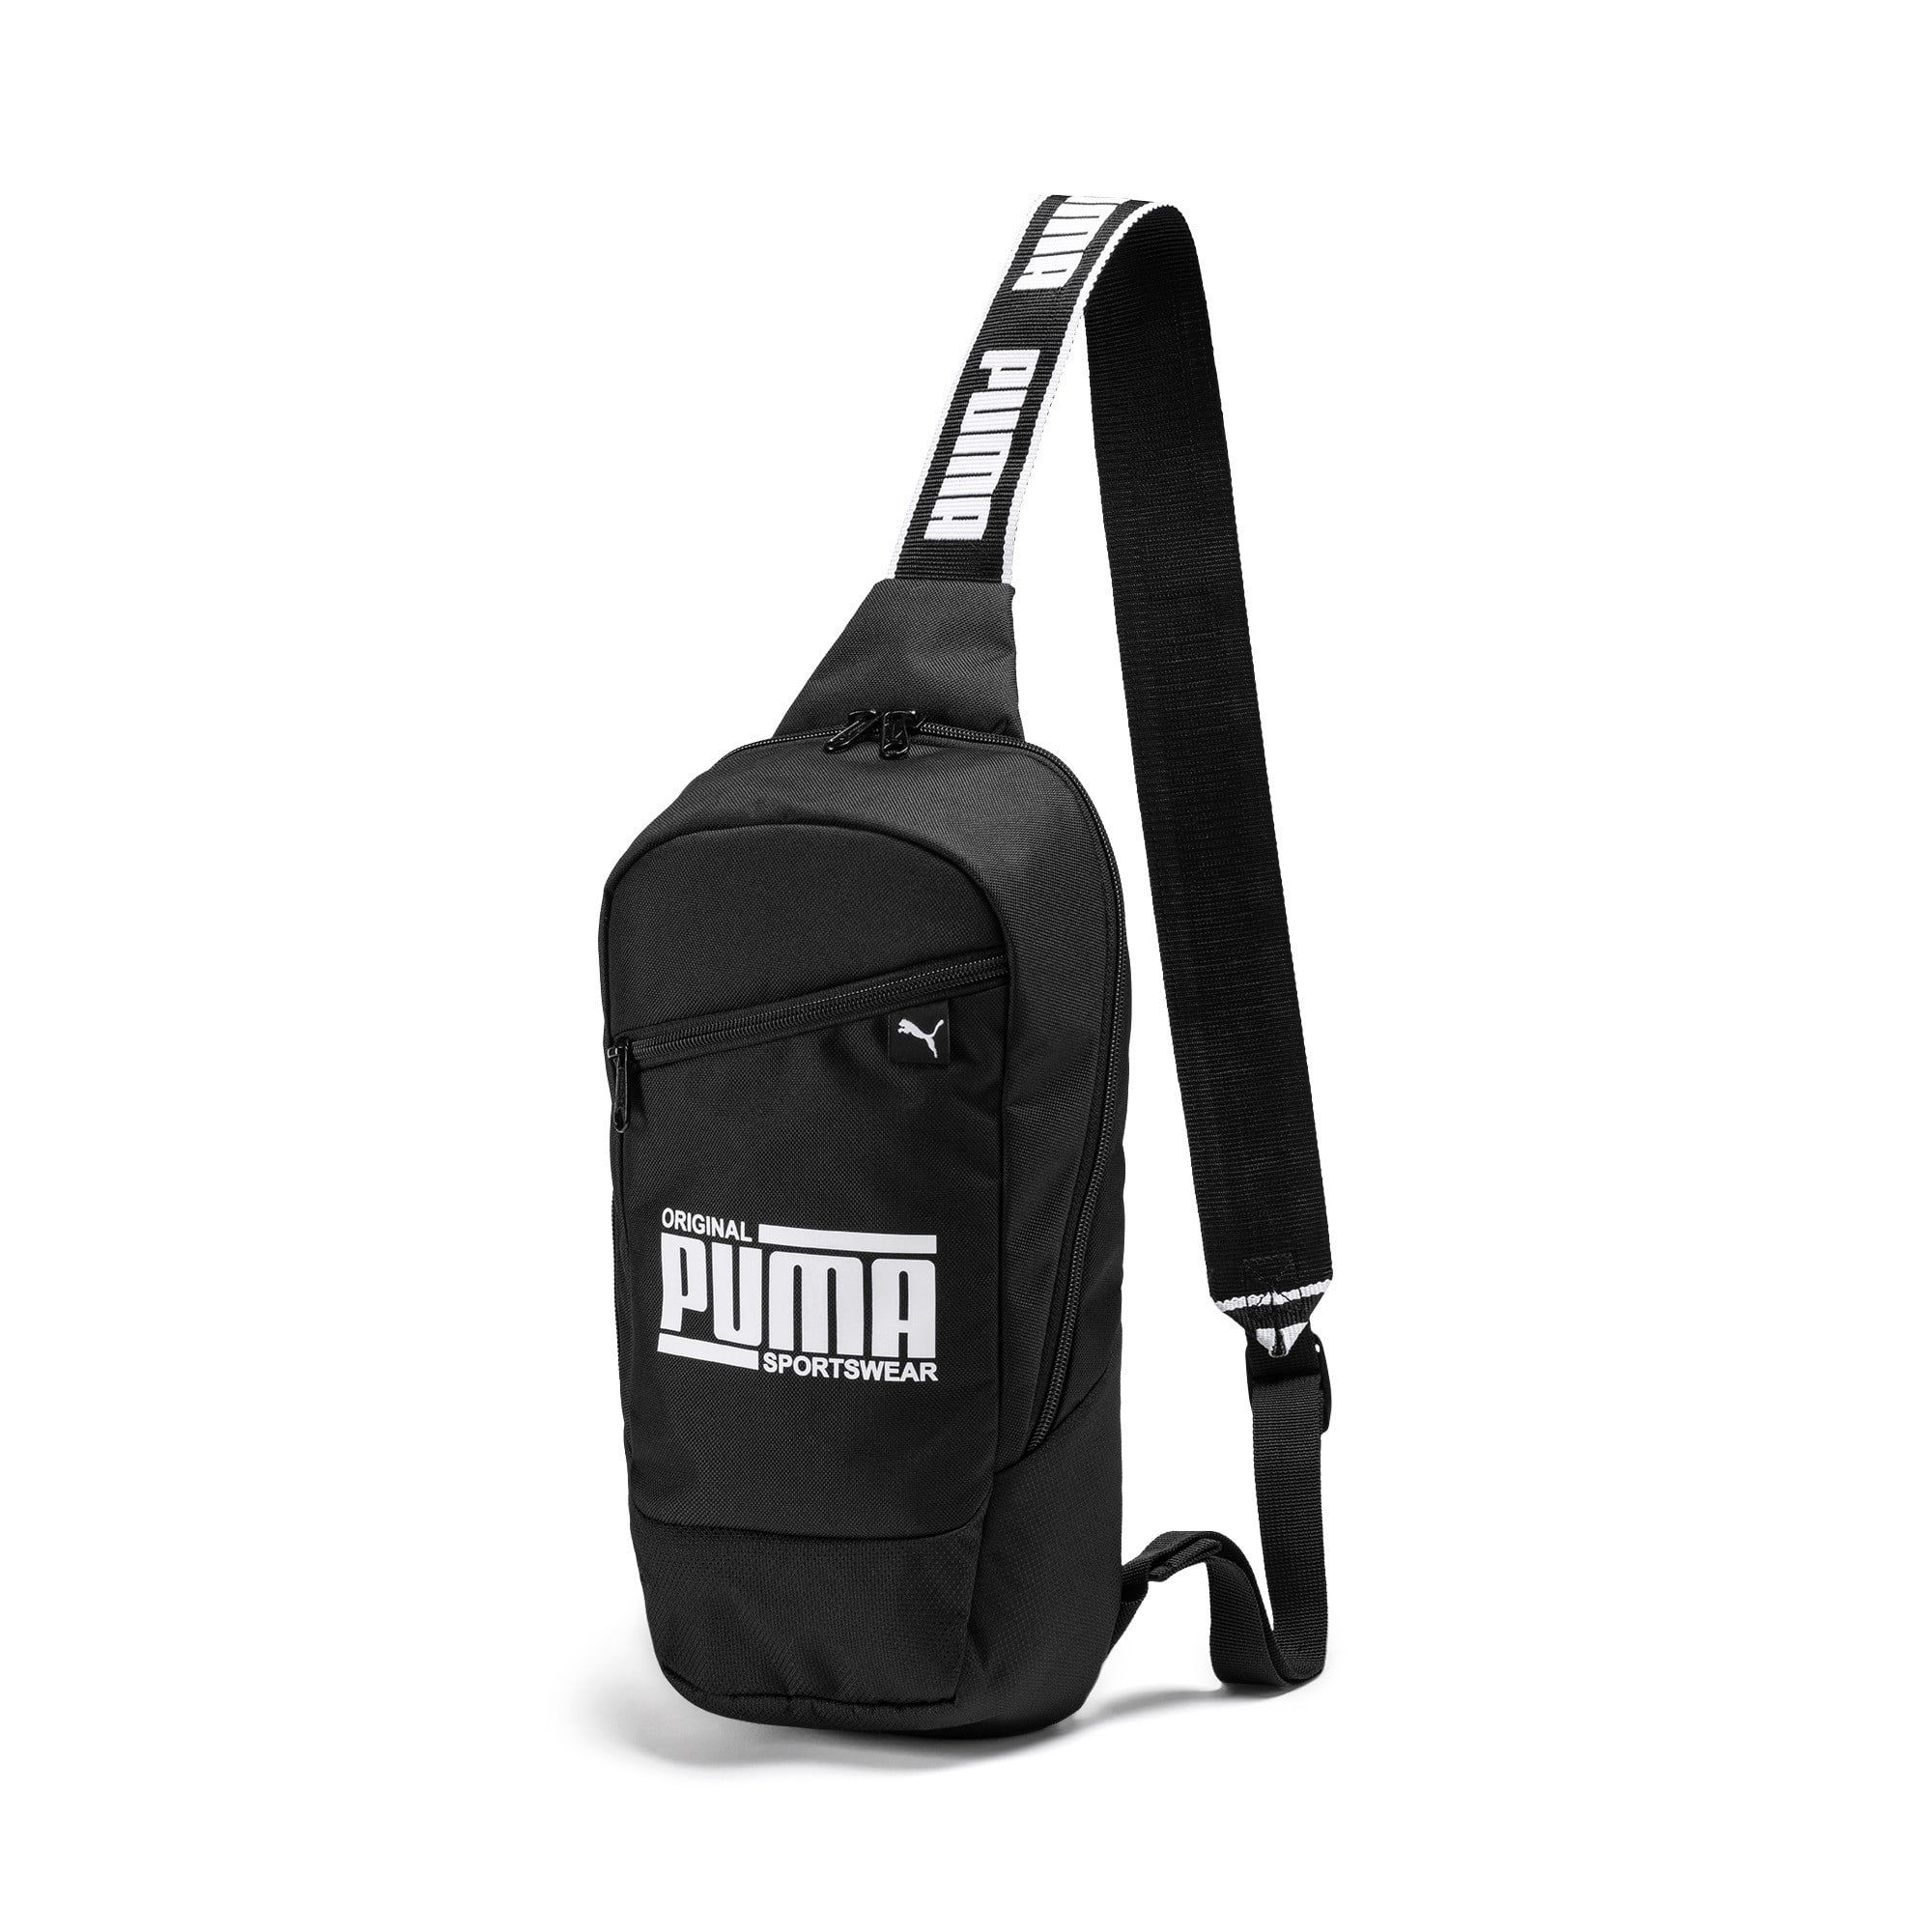 Thumbnail 1 of Sole X-body Bag, Puma Black, medium